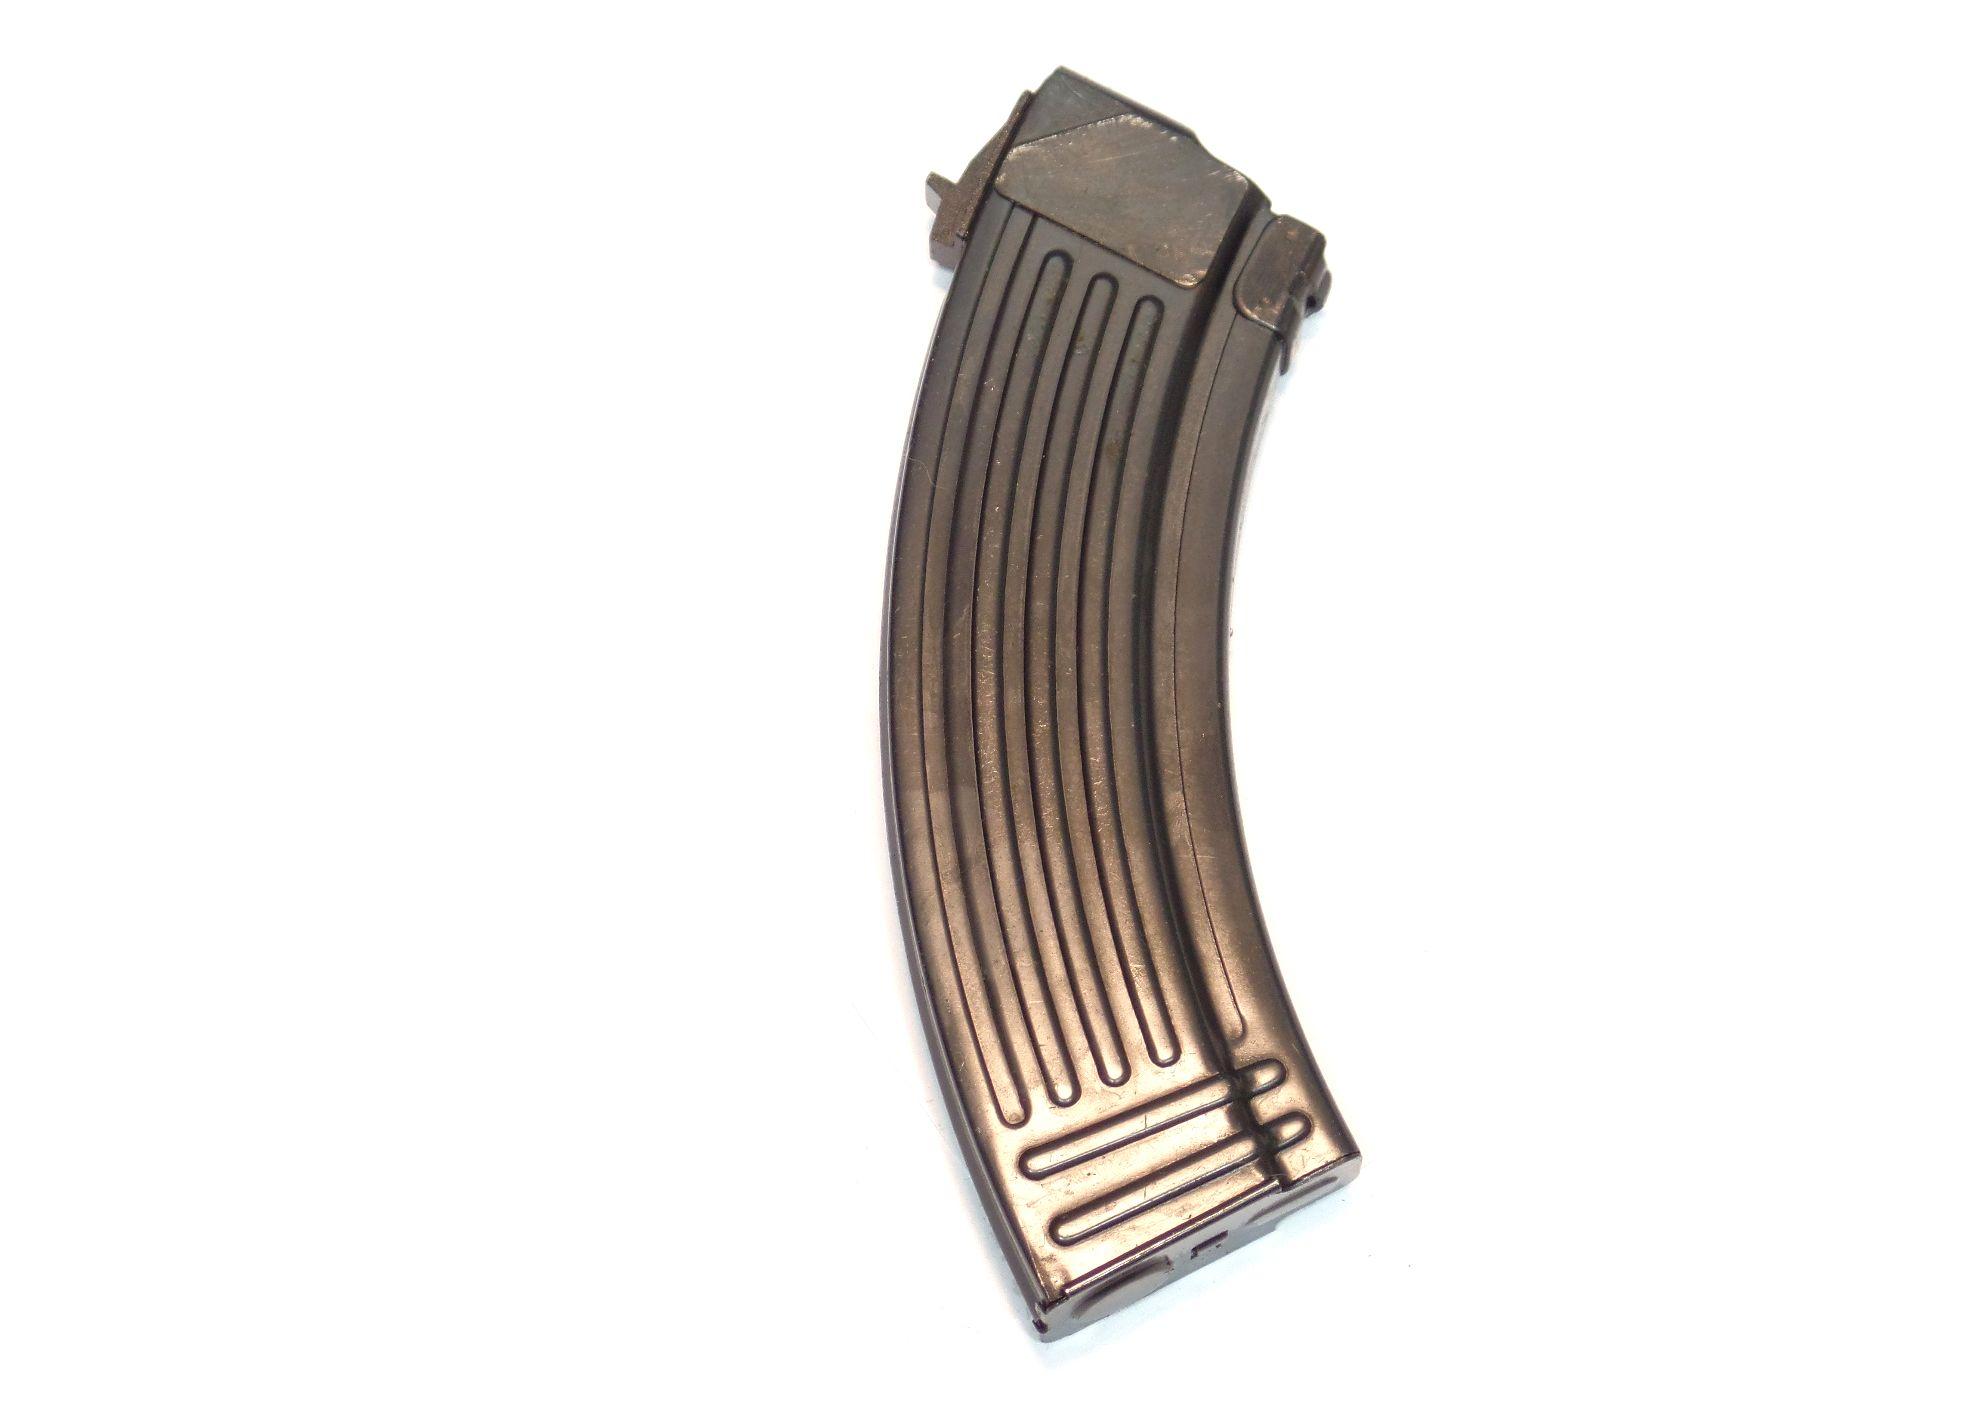 Chargeur Kalashnikov 7.62x39 / 5.45x39